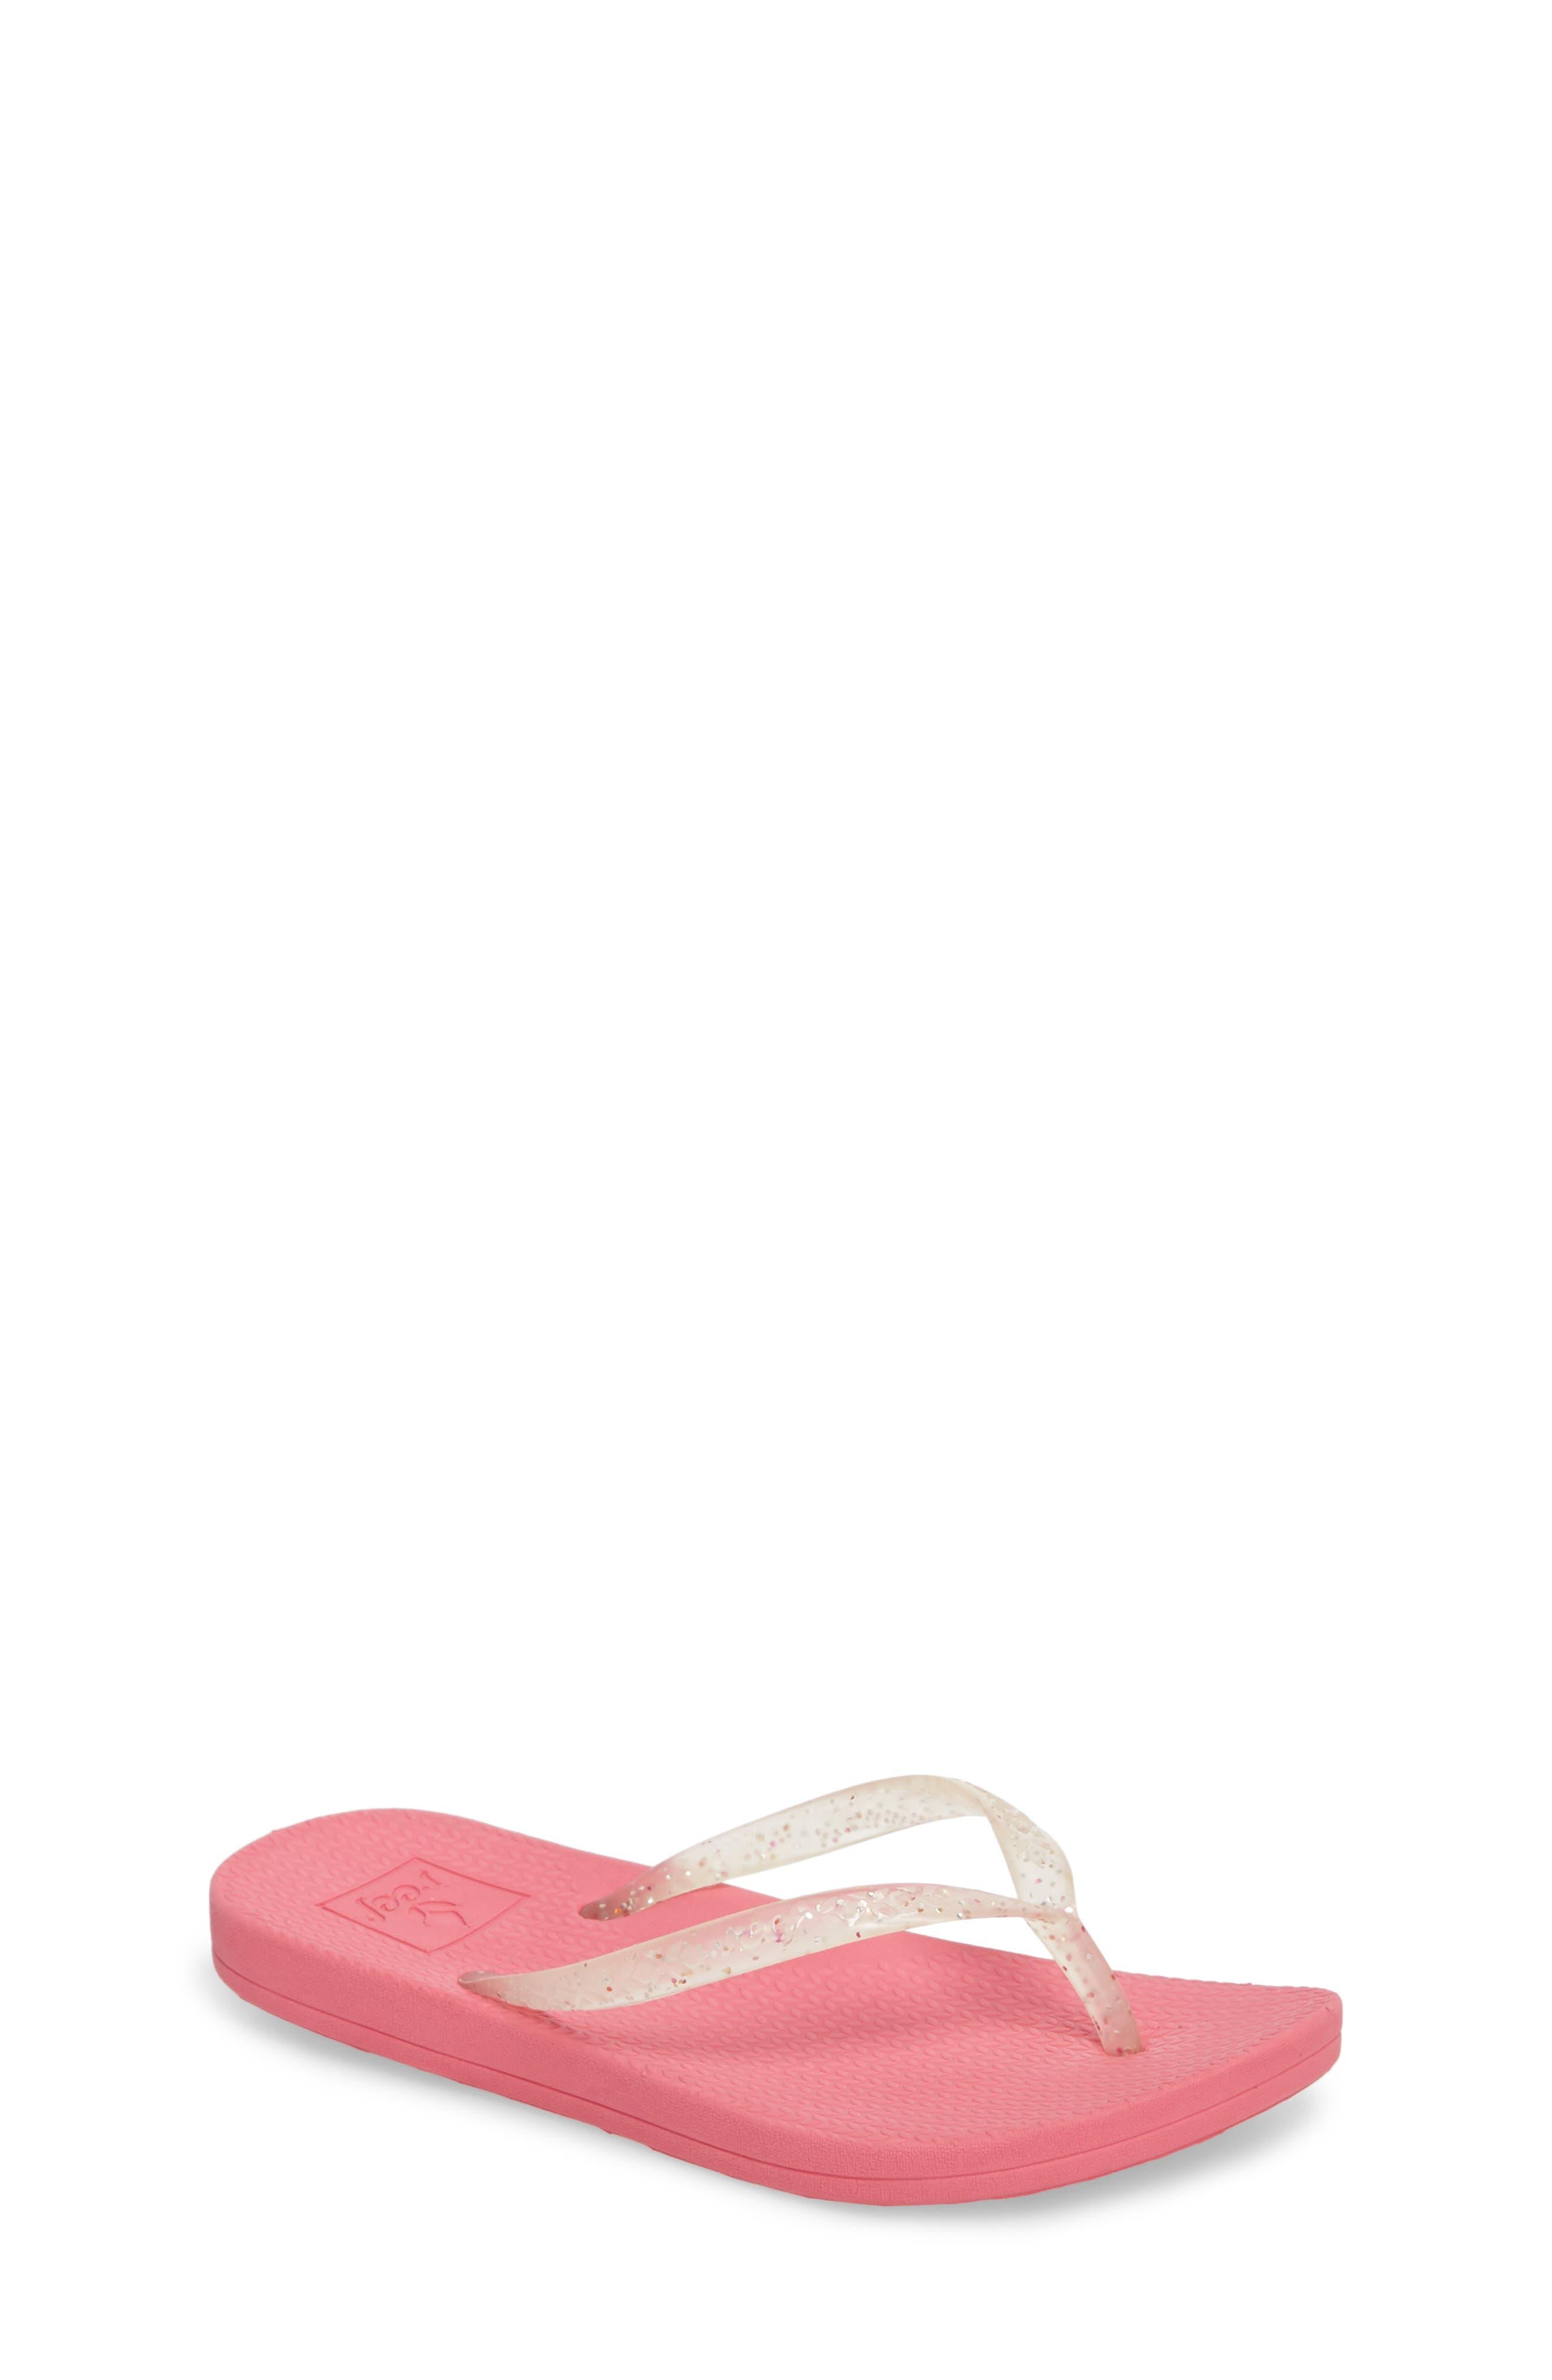 Little Reef Escape Shimmer Flip Flops,                             Main thumbnail 1, color,                             Pink